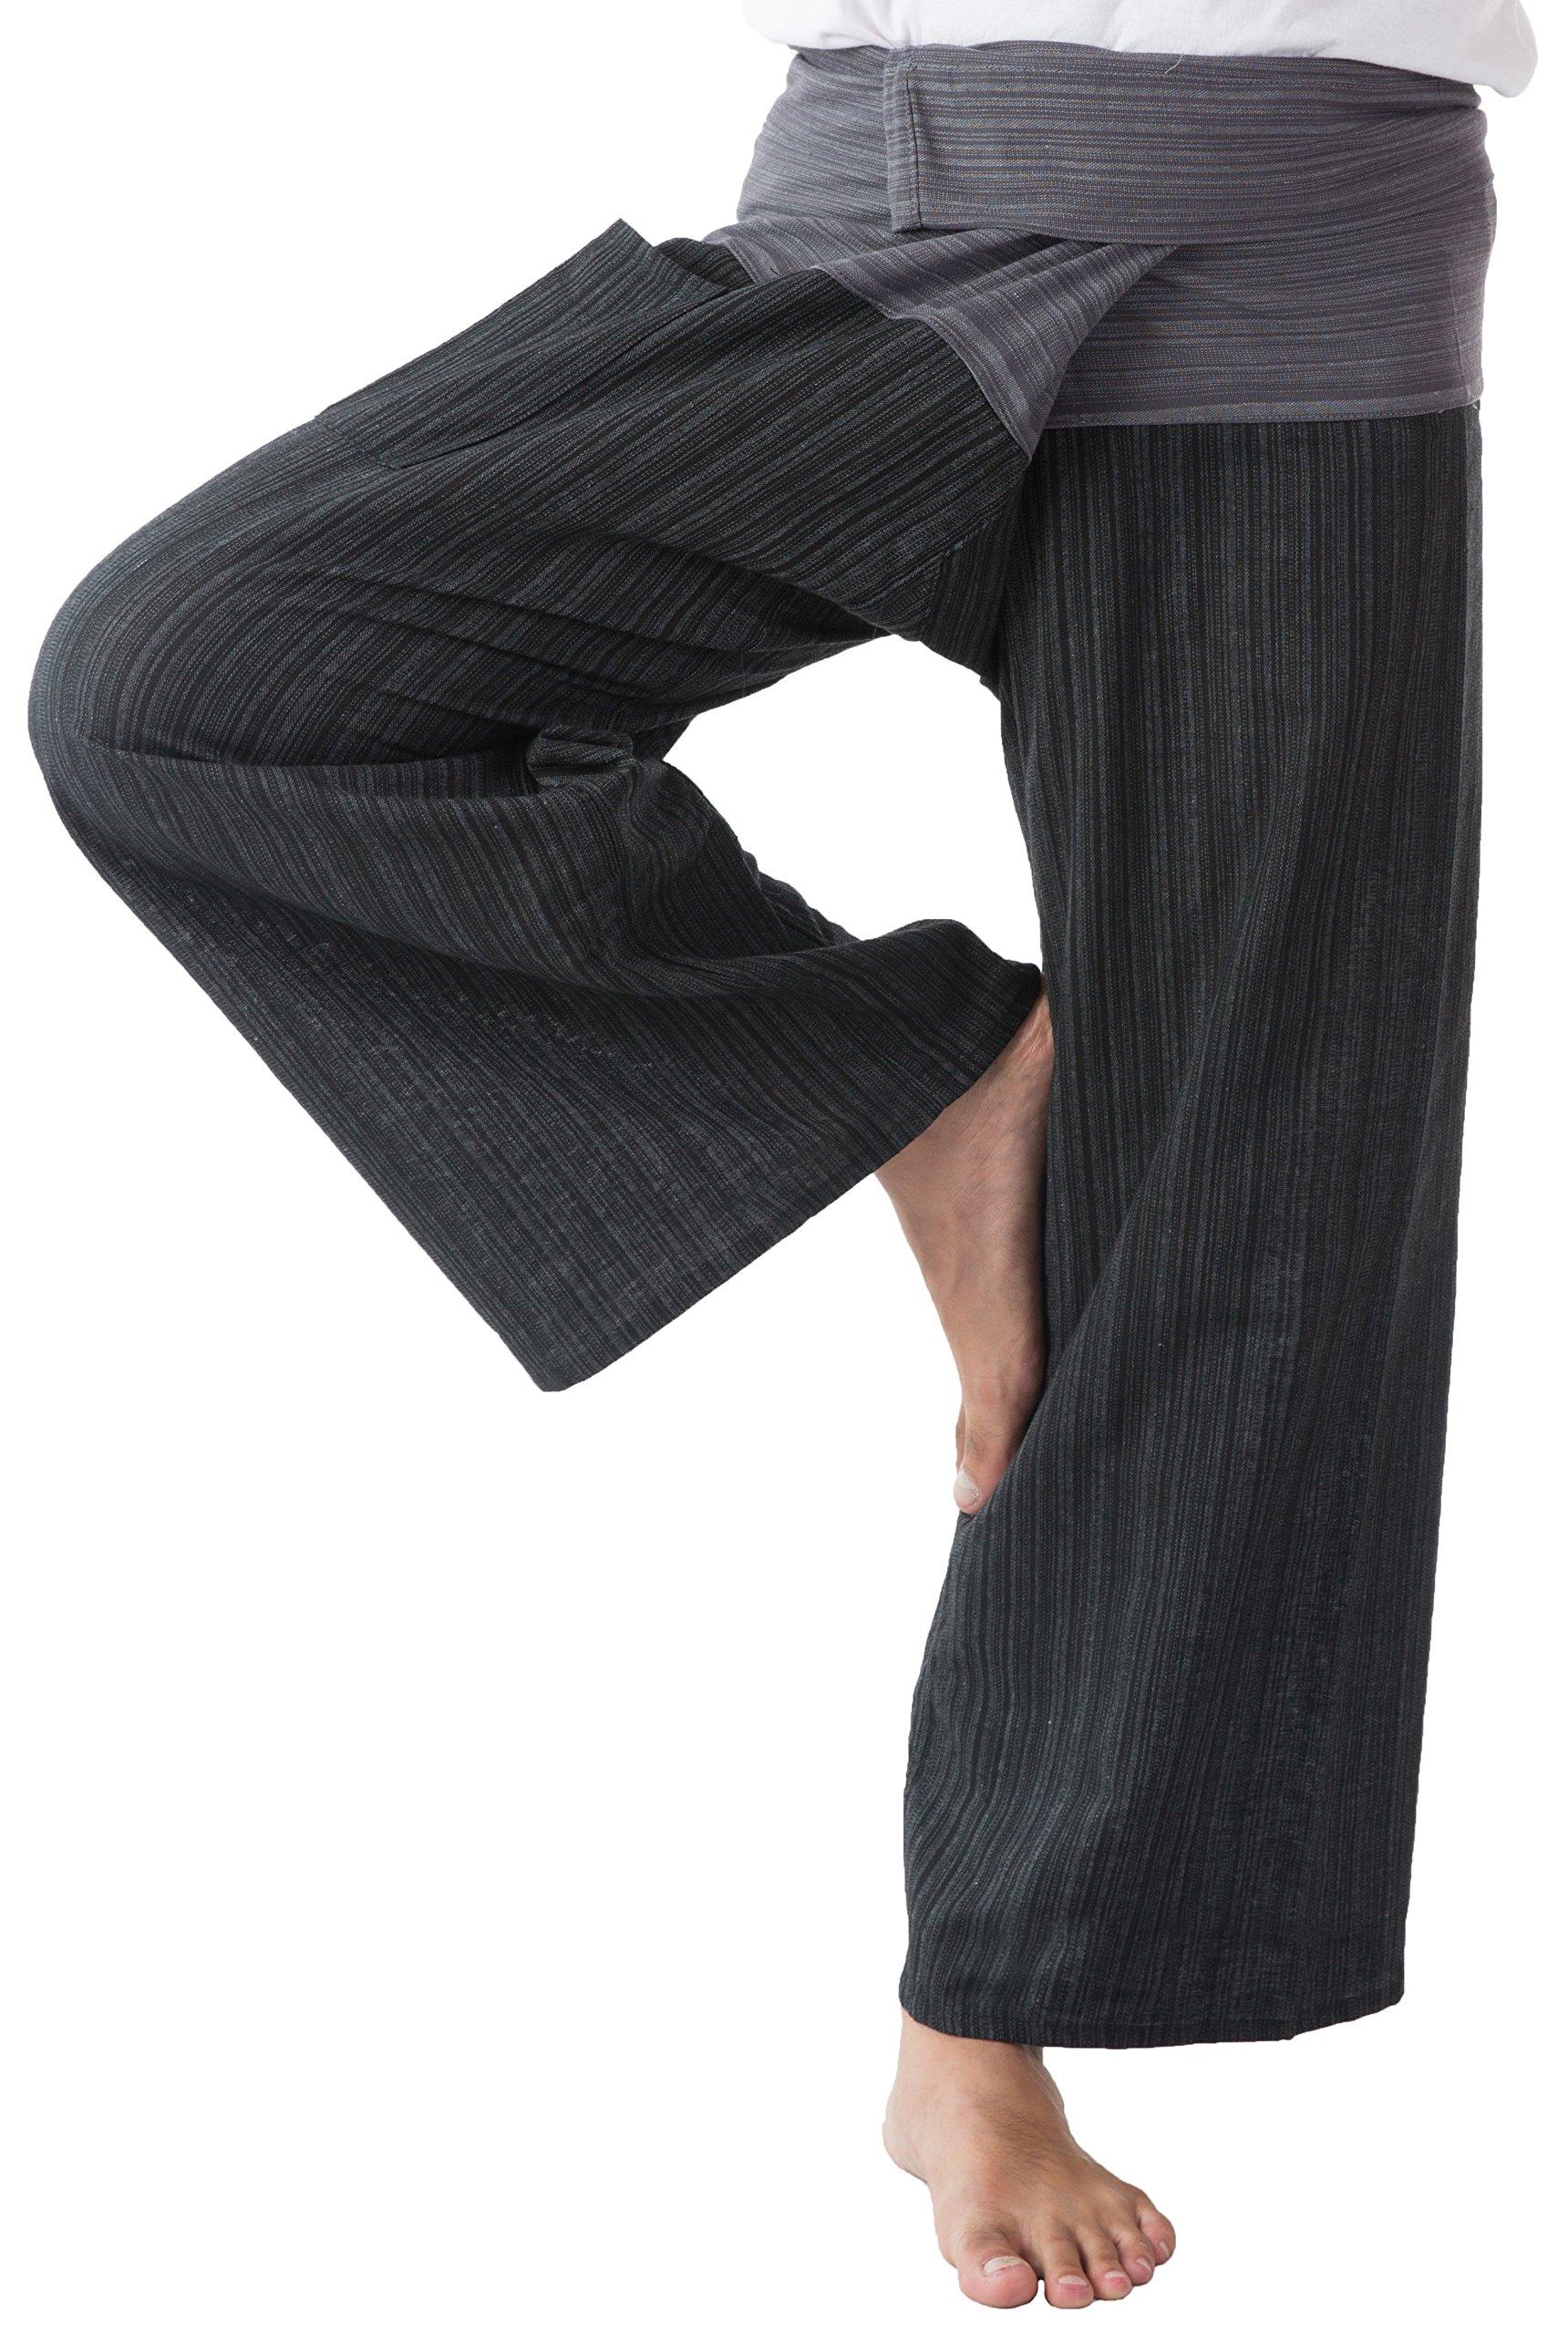 Thai Fisherman Pants Men's Yoga Trousers Gray and Charcoal 2 Tone Pant